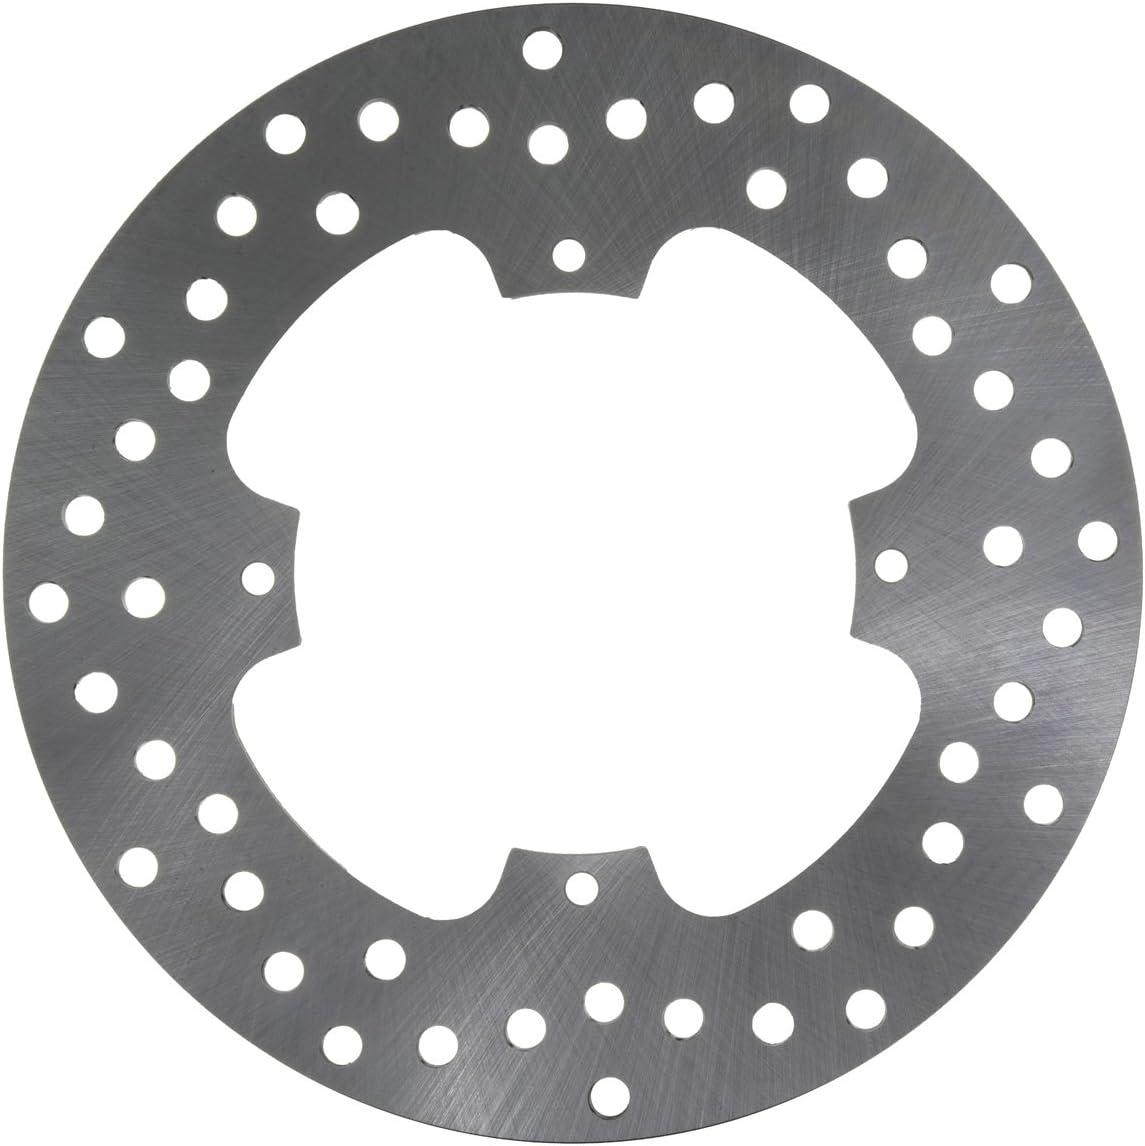 Front Disc Brake Rotor /& Brake Pads Honda XR250R XR400R XR600R XR650R SEE YEARS